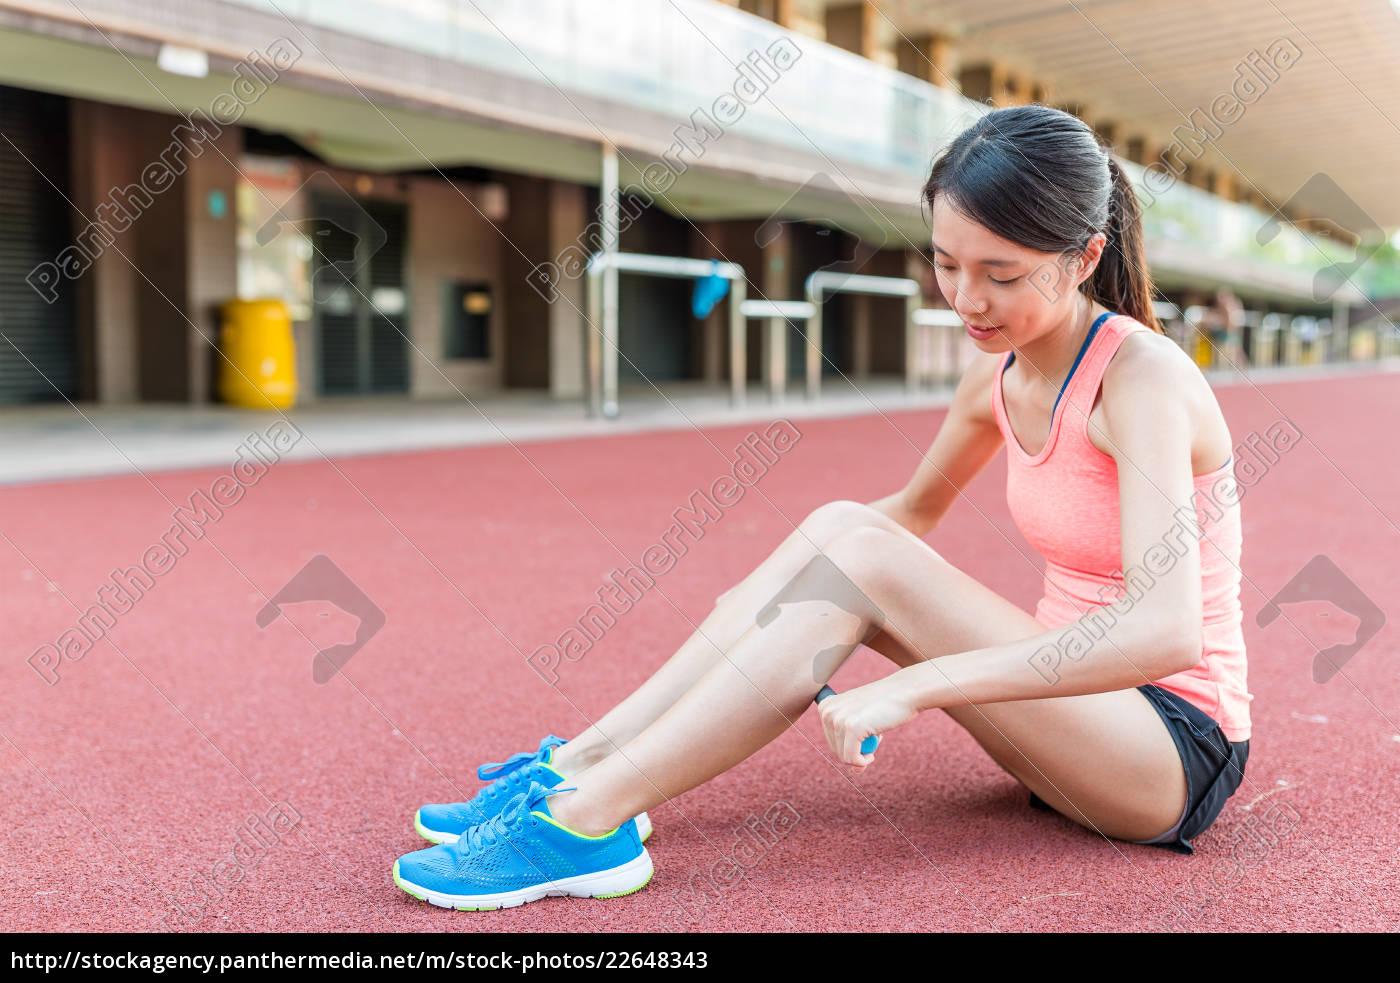 woman, using, stick, massage, roller, on - 22648343